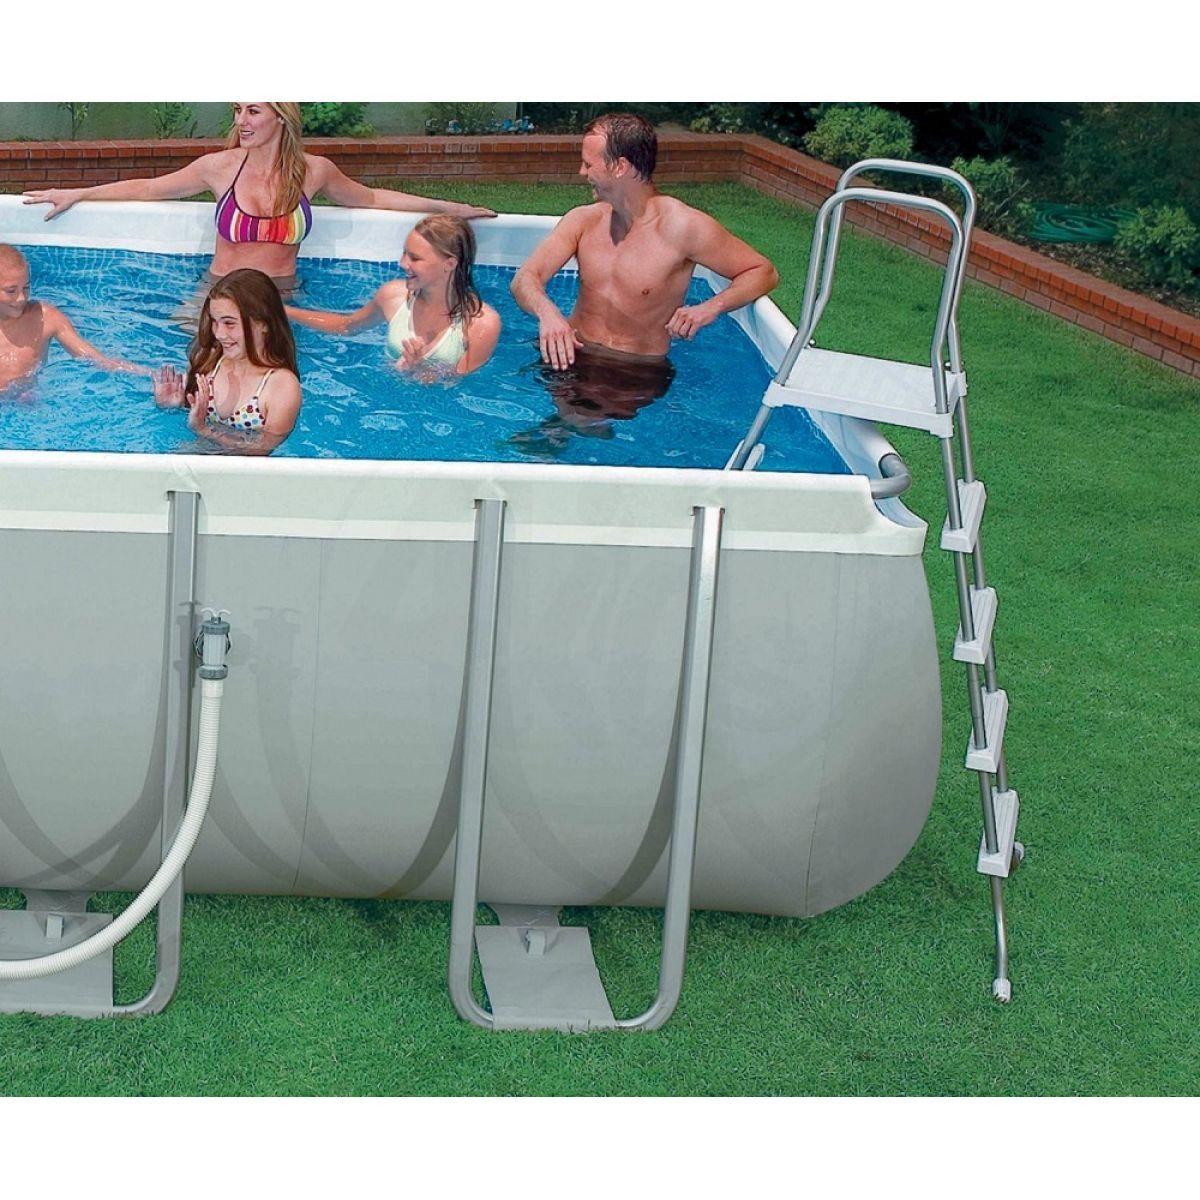 intex 28362 ultra frame pool 732 x 366 x 132 cm 4kids. Black Bedroom Furniture Sets. Home Design Ideas